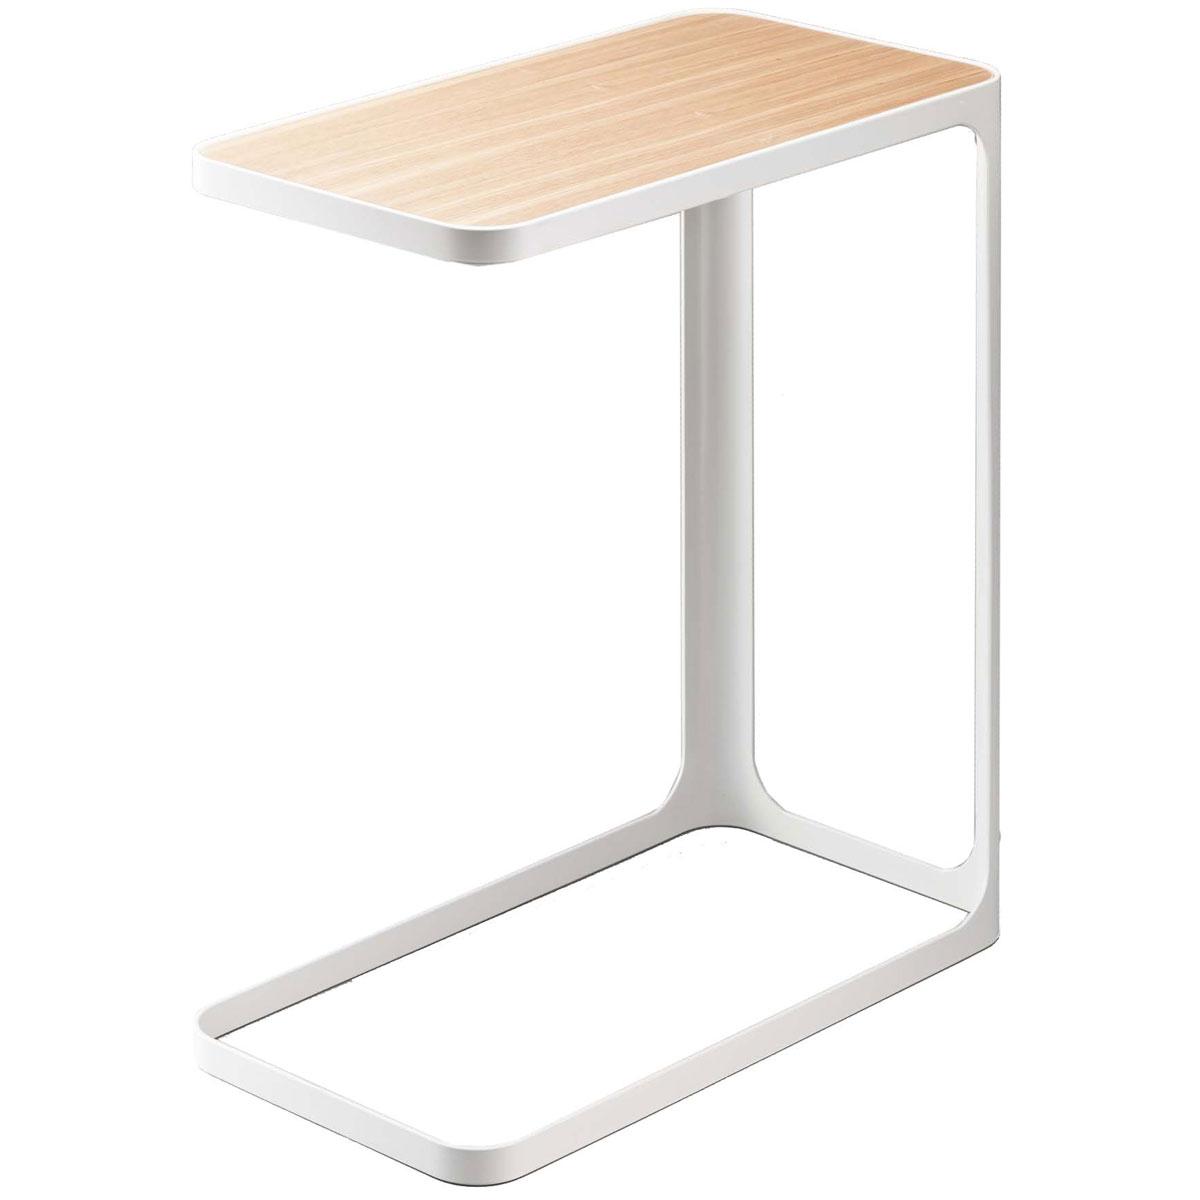 frame サイドテーブル ホワイト